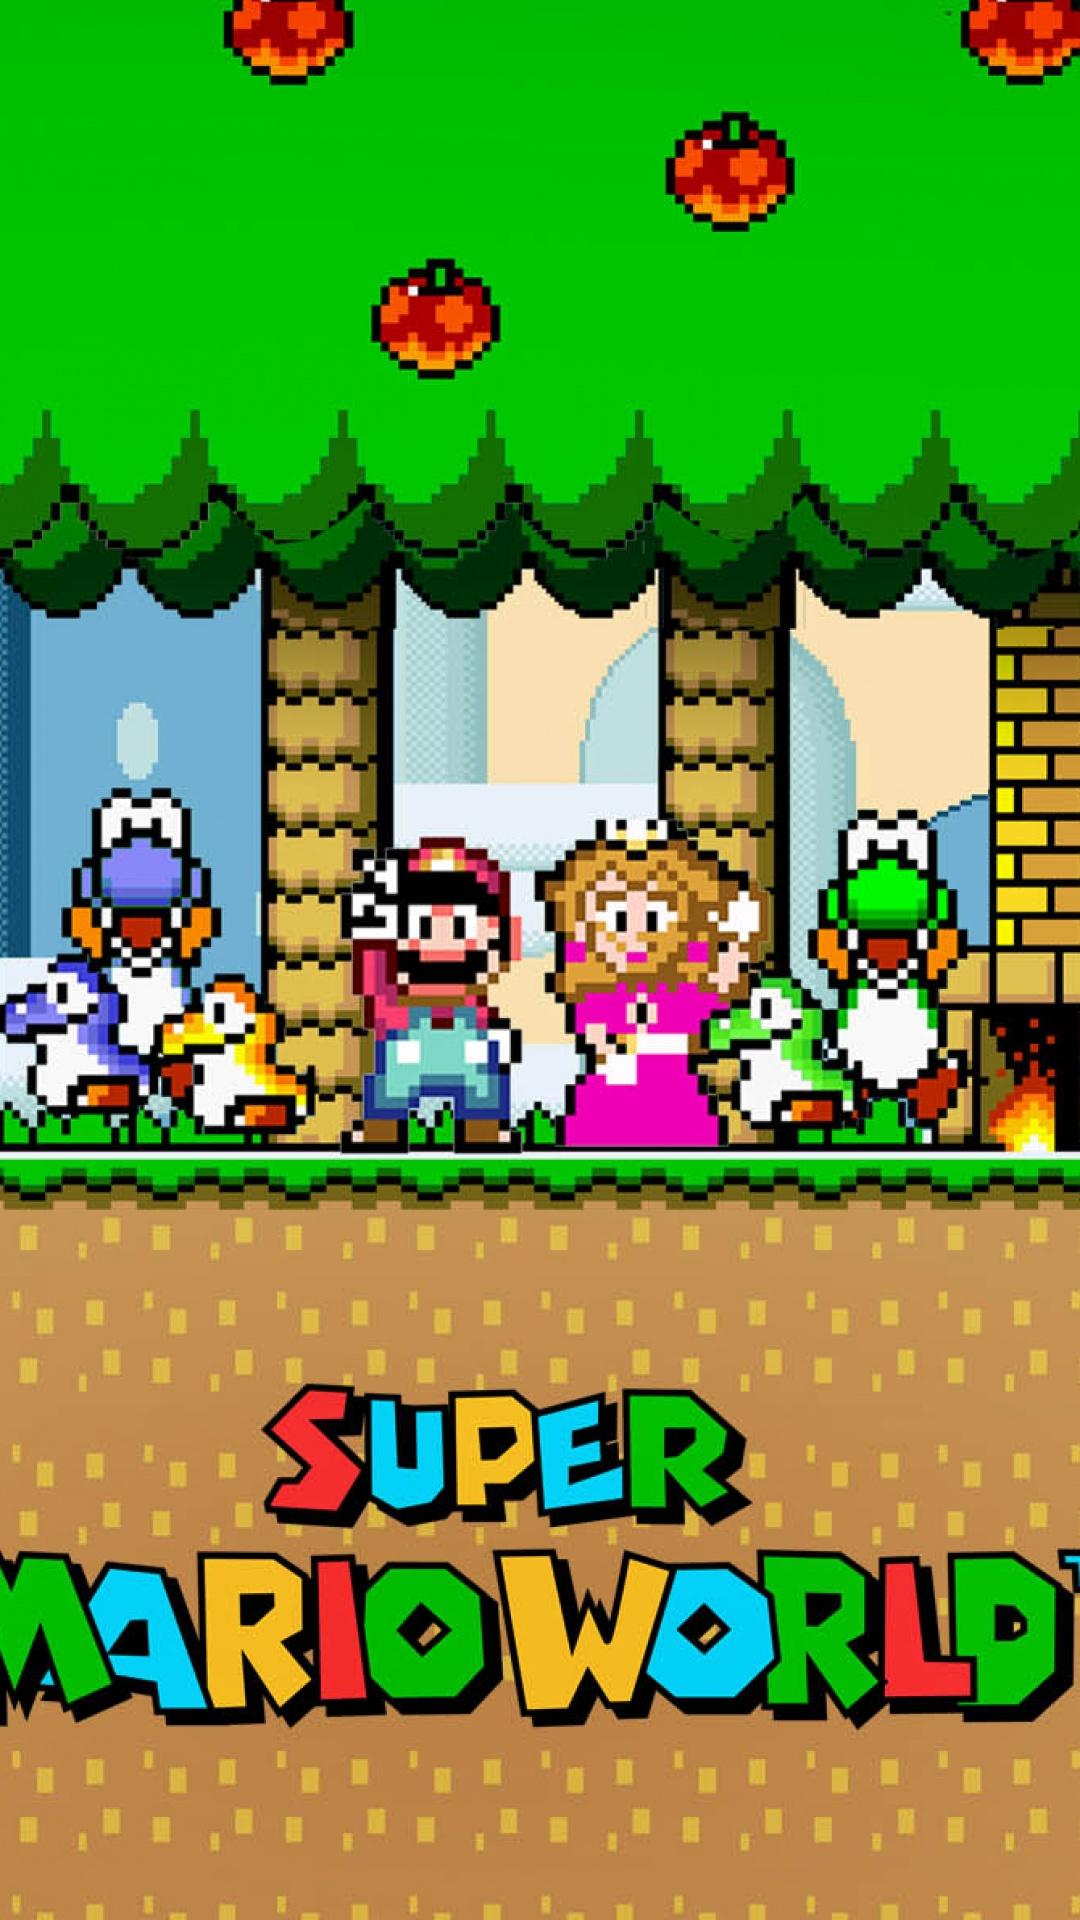 Free Download Super Mario World Wallpapers 39 Desktop Images Of